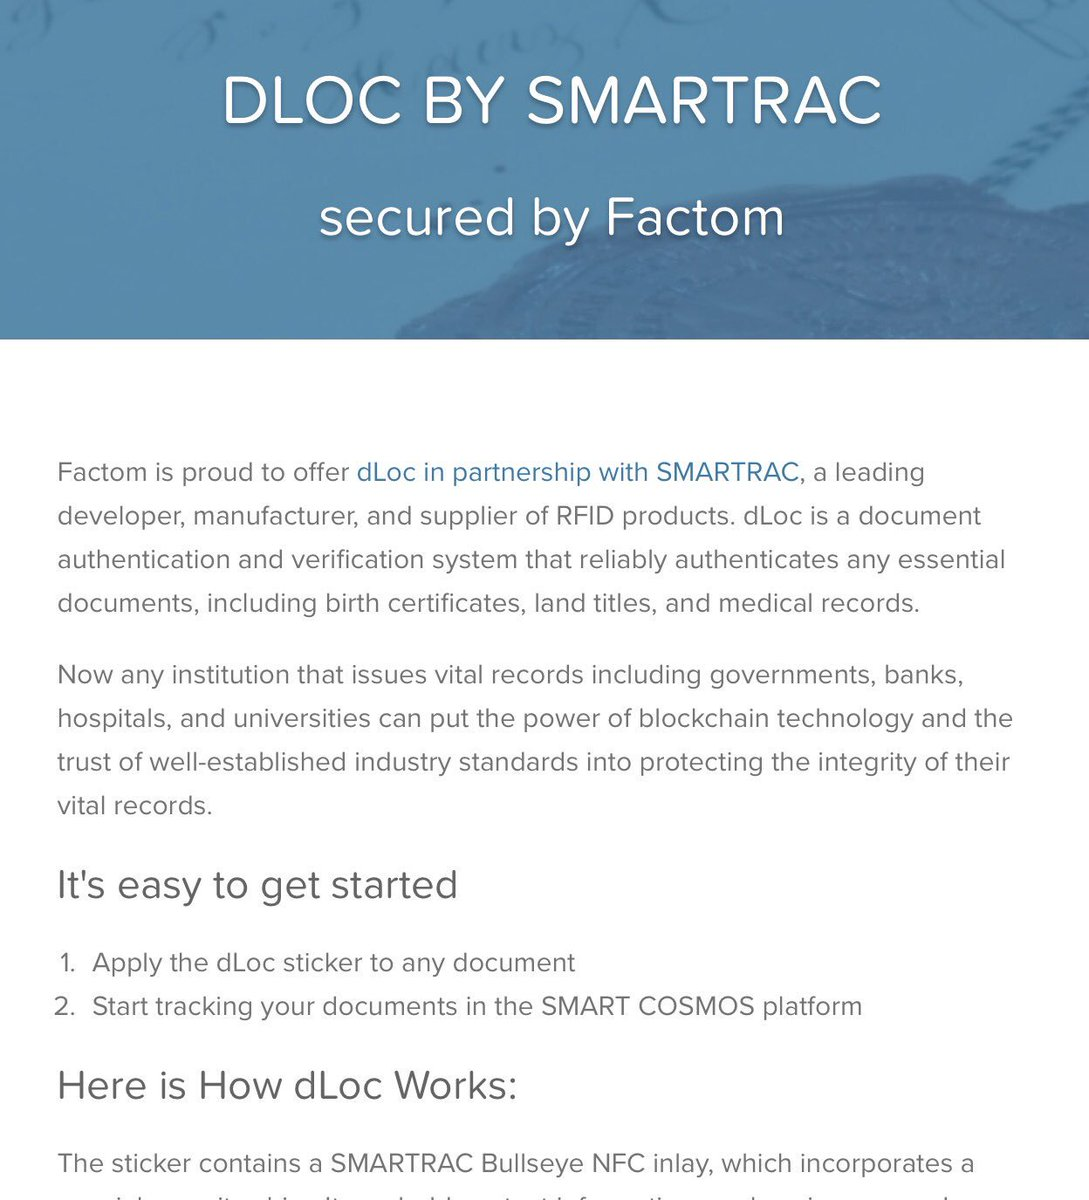 Etiqueta #smartrac al Twitter